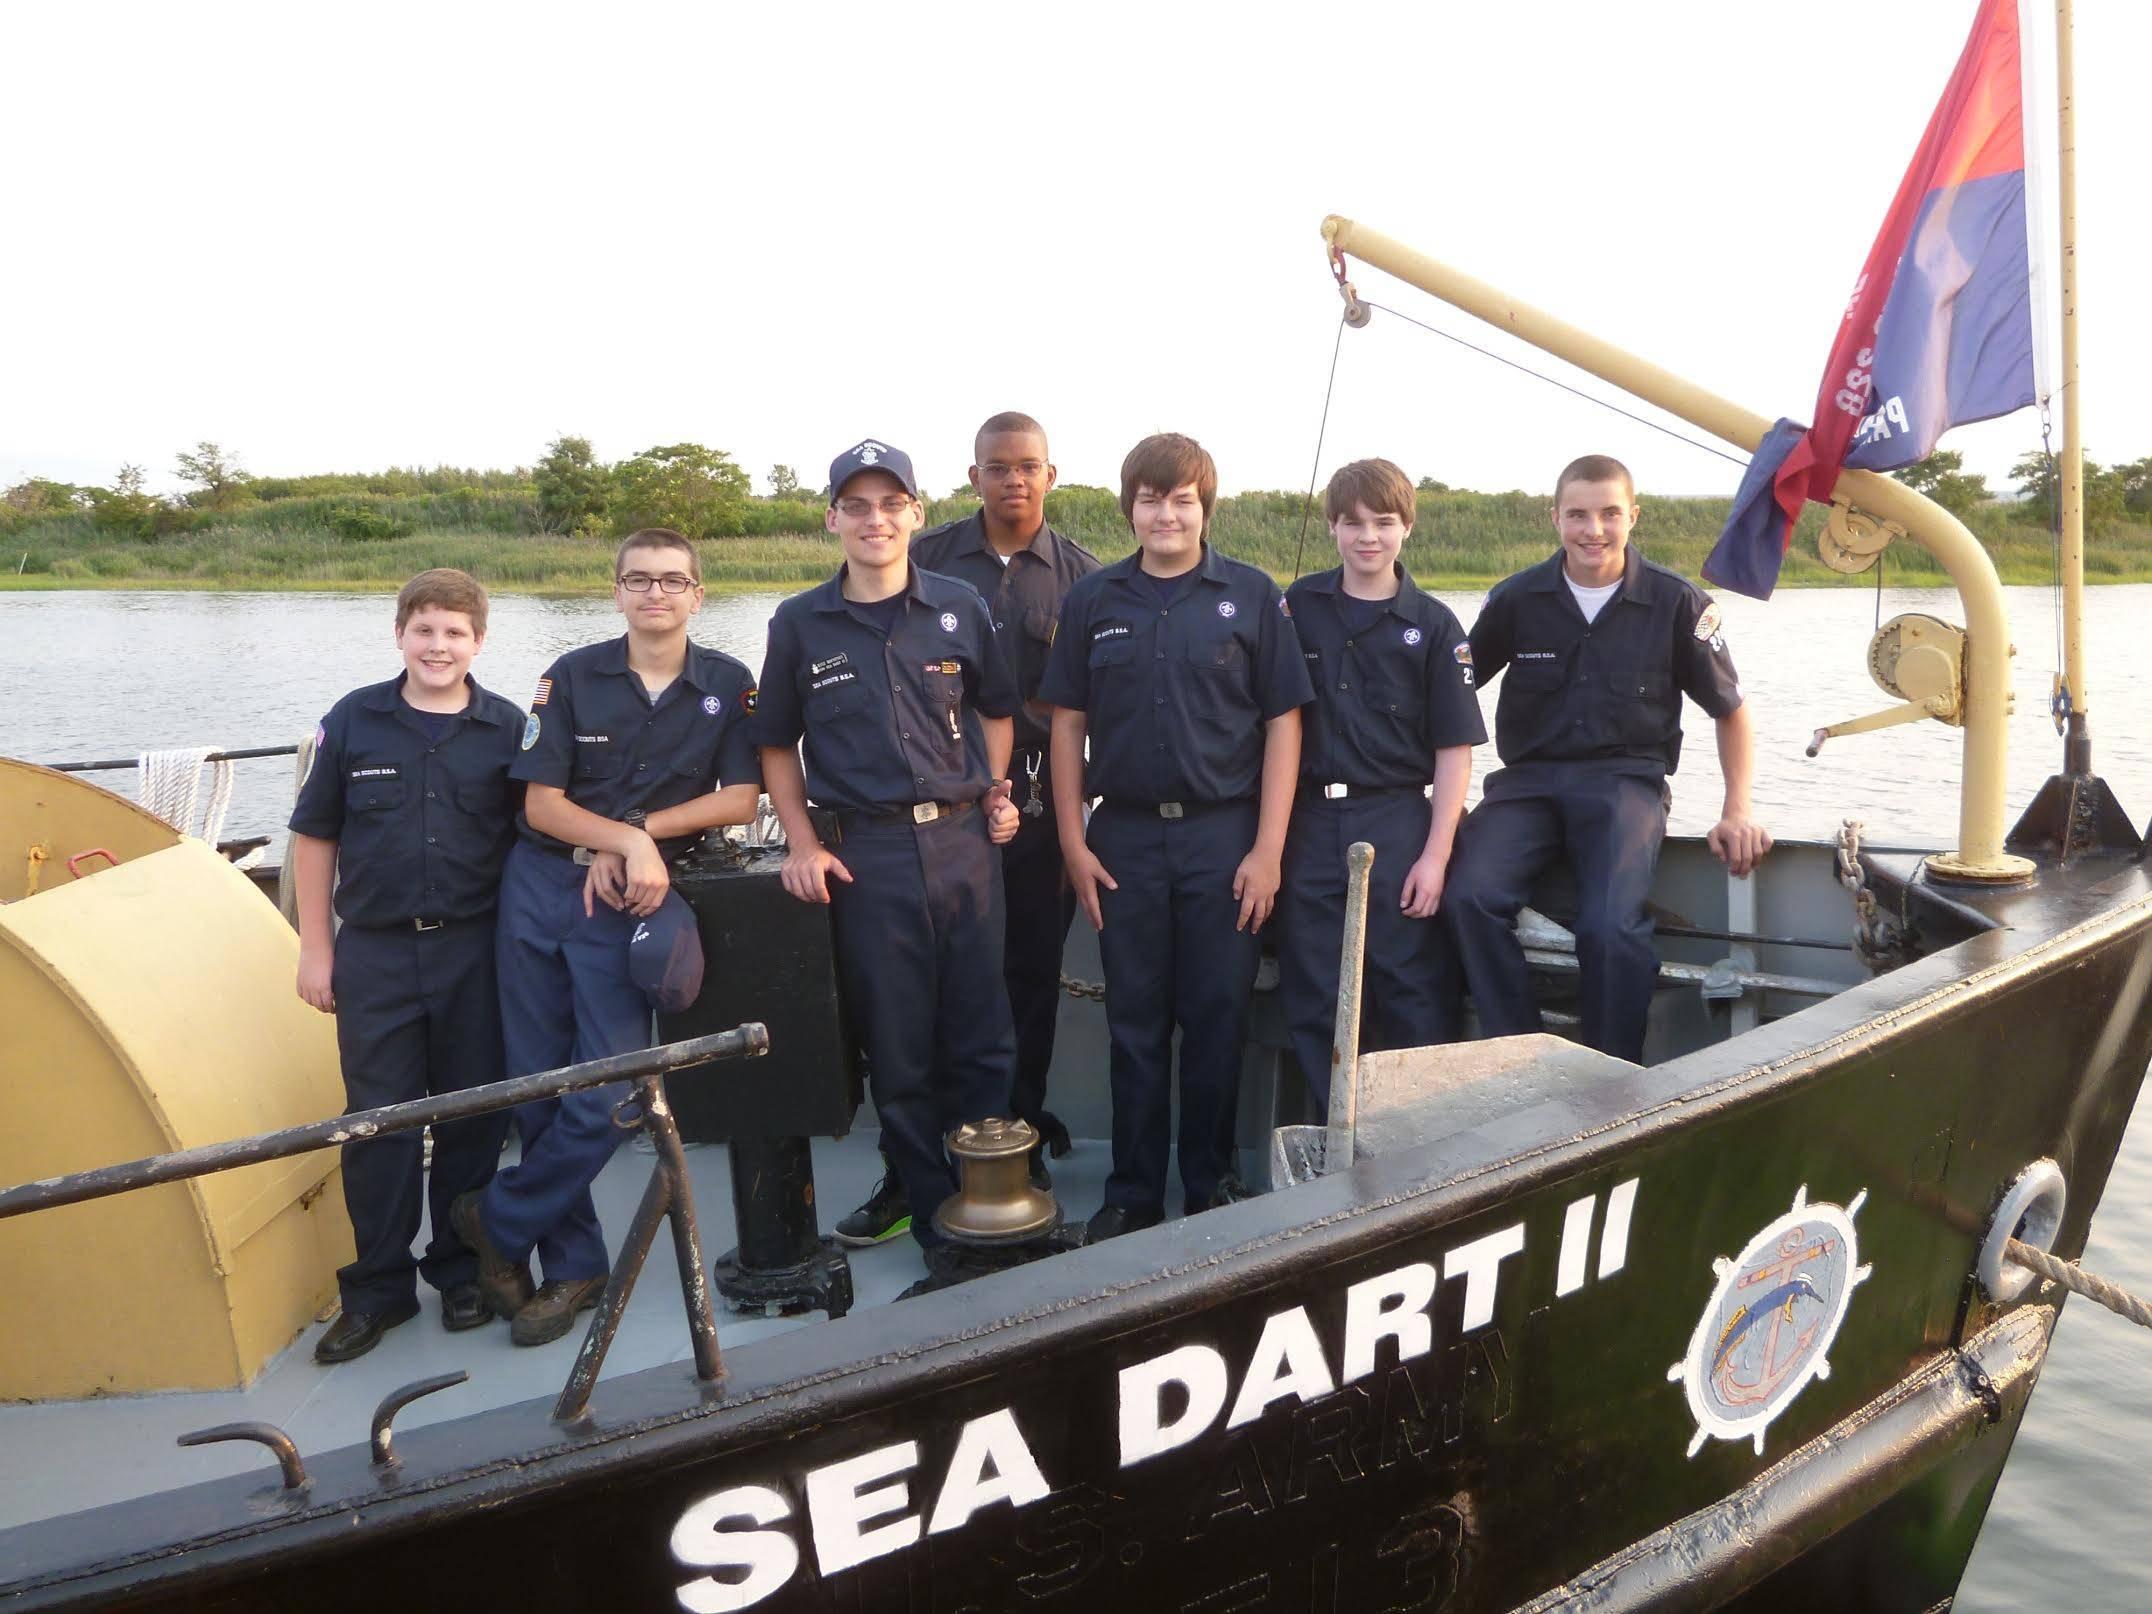 56e3b3a7fefe597e452e_BSA_Sea_Dart_w_104_Scouts.jpg